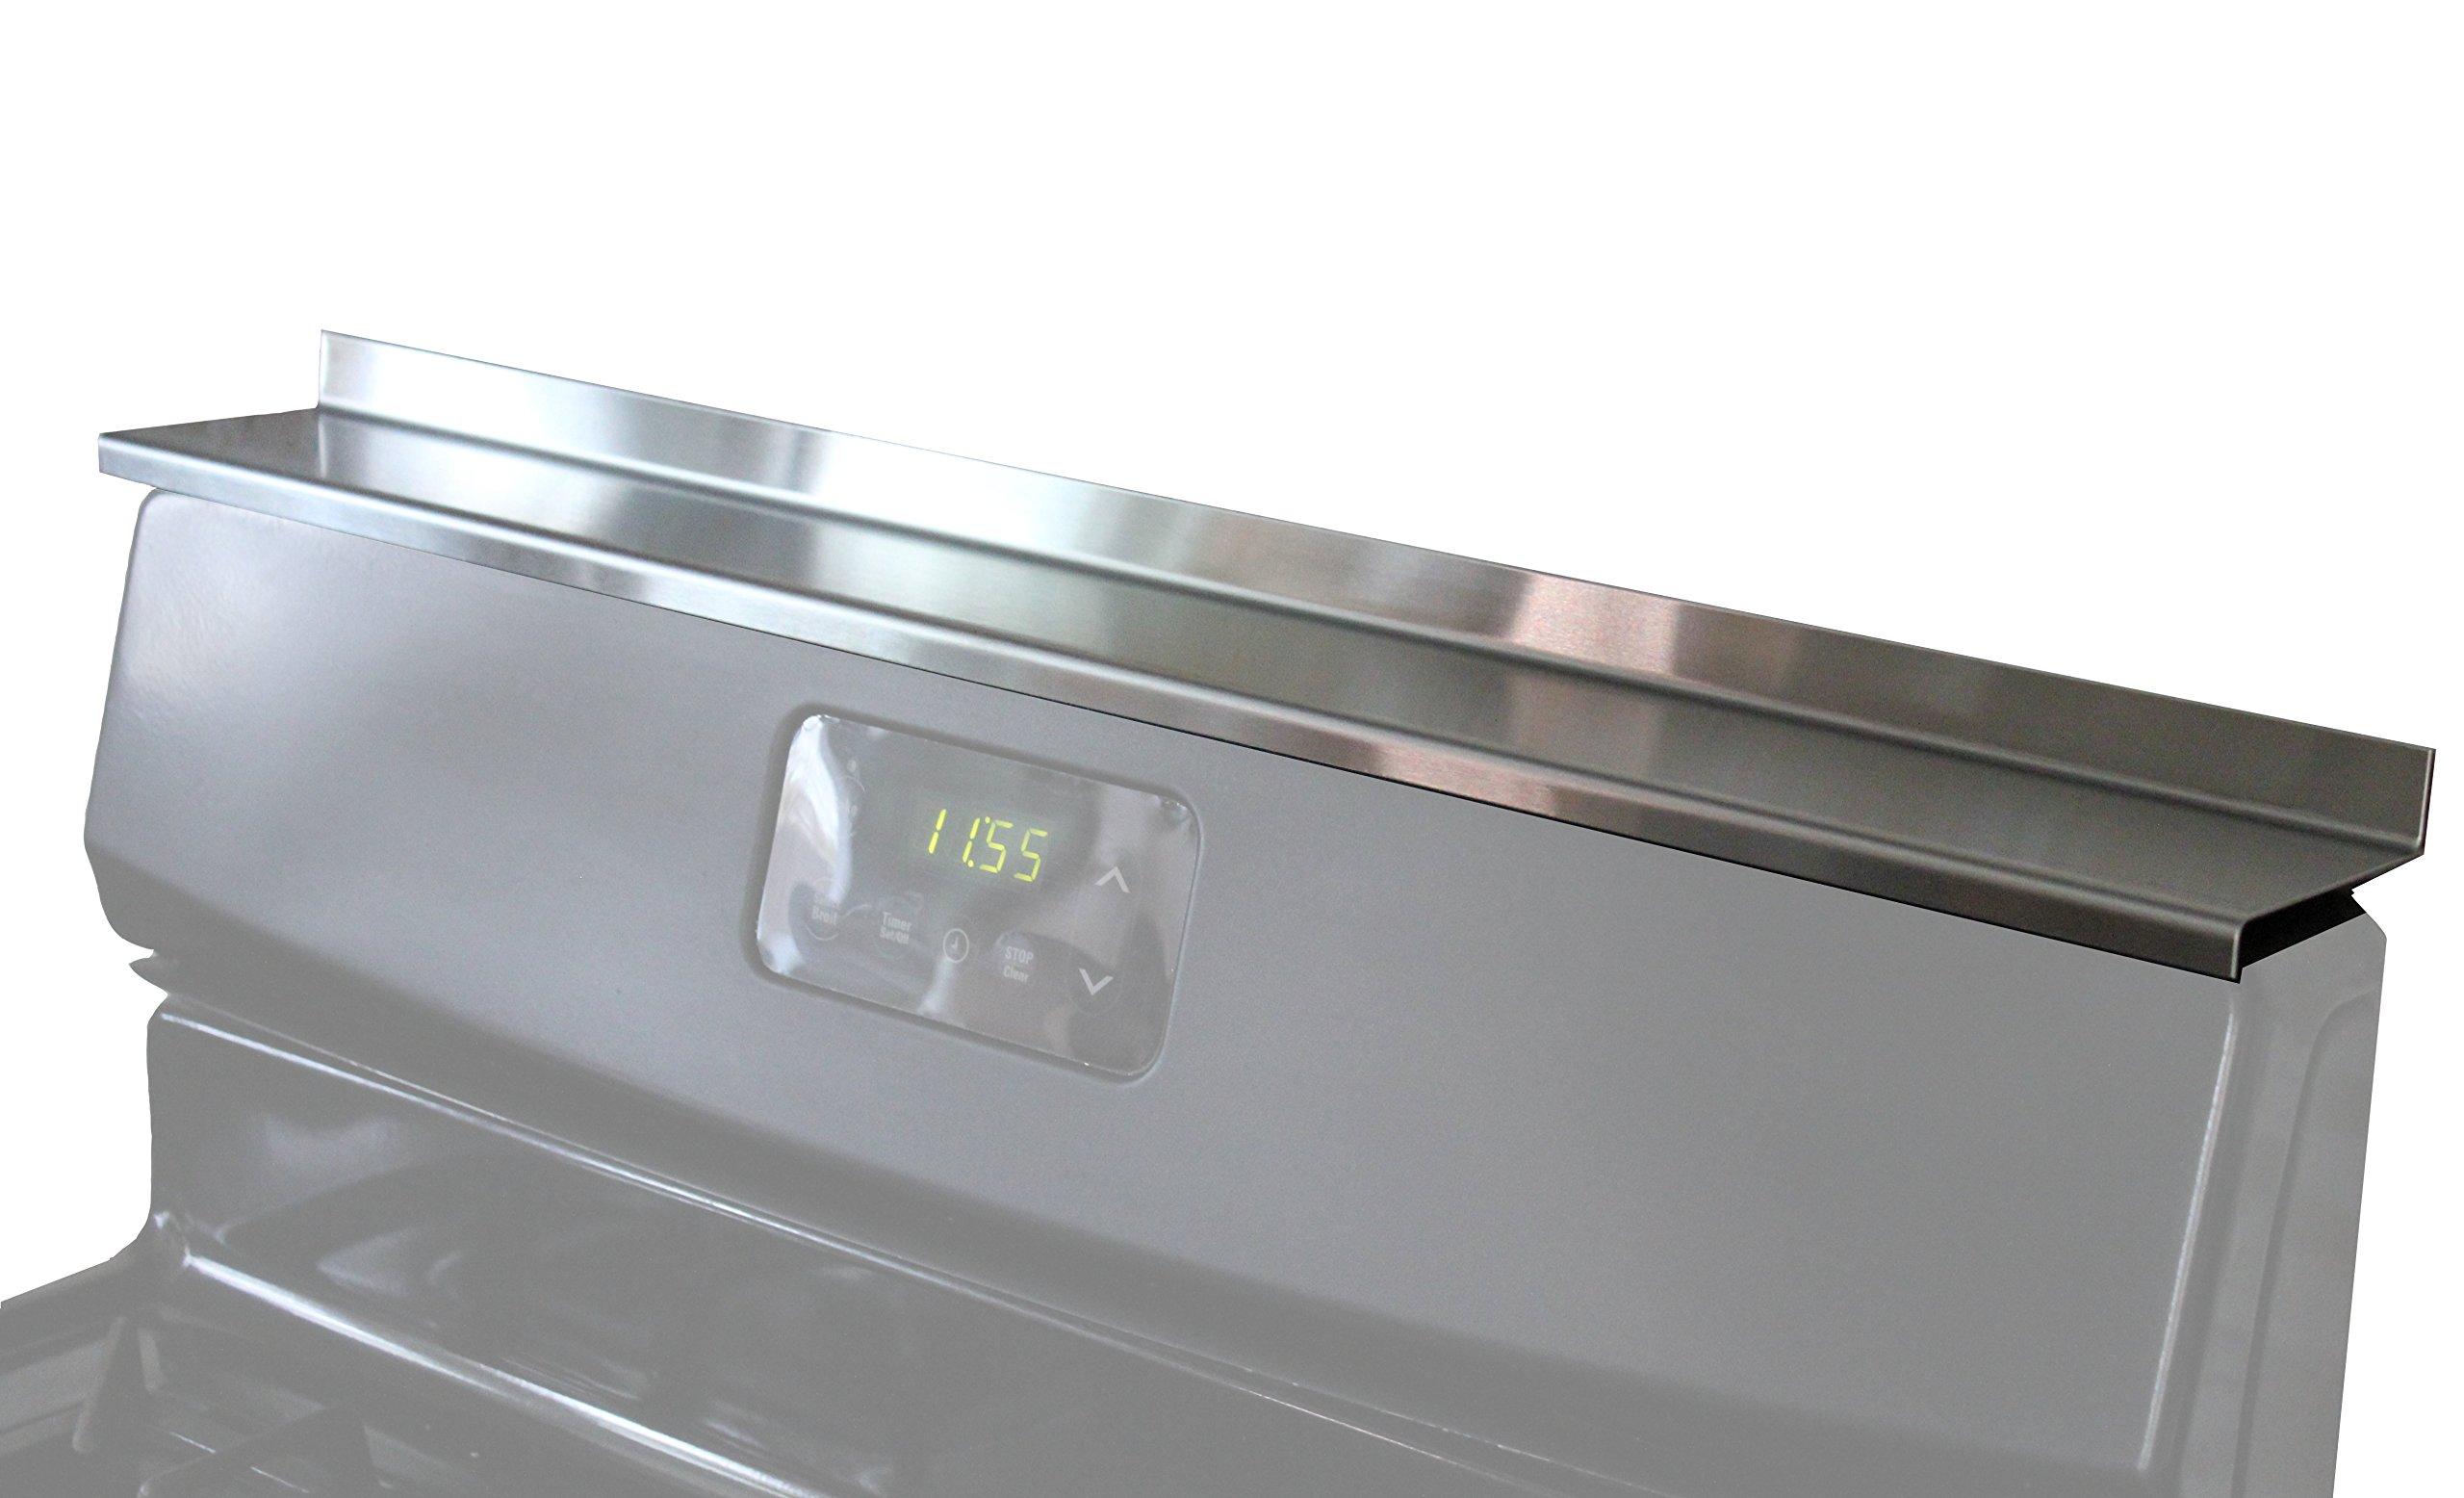 StoveShelf -Stainless Steel - 30'' - Magnetic Shelf for Kitchen Stove, Spice Rack, Kitchen Storage Solution, Zero Installation